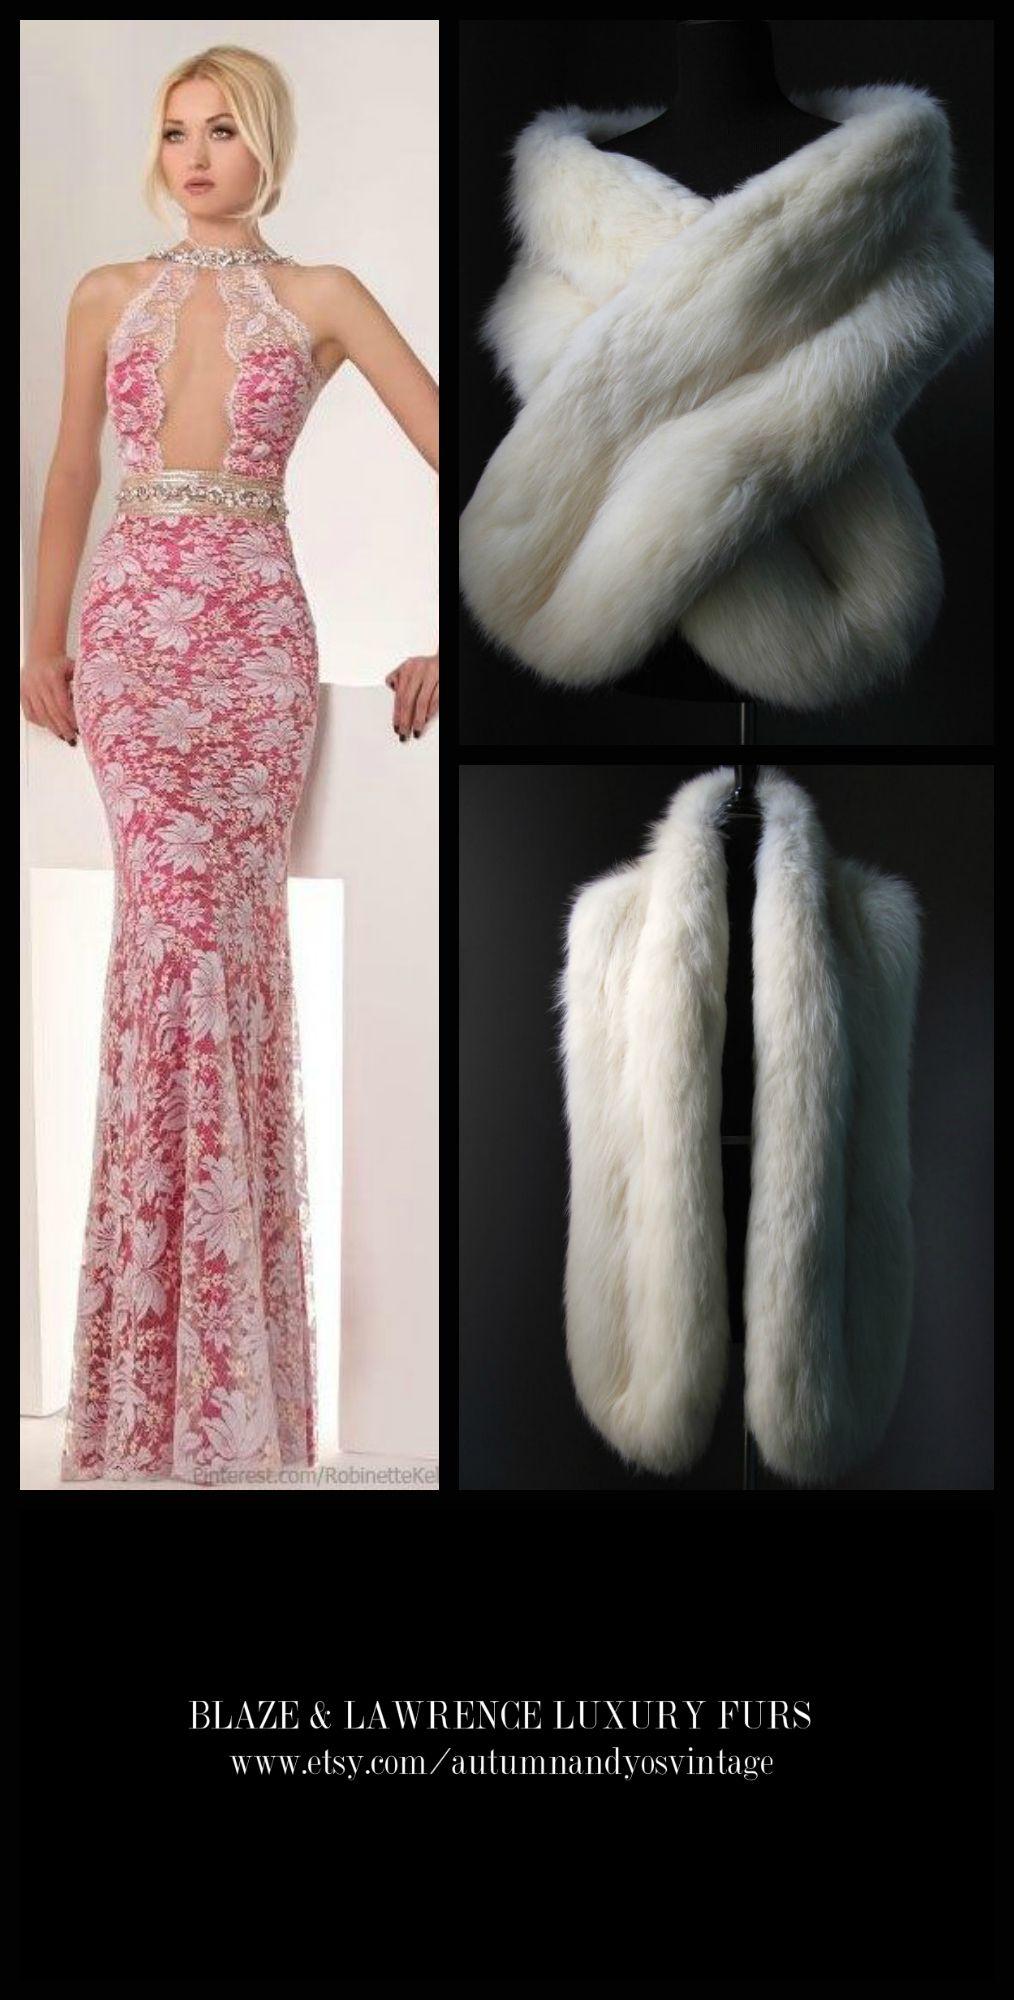 Stay luxuriously warm……..……...https://www.etsy.com/shop/AutumnandYosVintage?ref=hdr_shop_menu….#luxury #luxurylife #luxe #fashion #style #trend #gown #dress #fur #mink #fox #classic #gift #wedding #bridal #redcarpet #blacktie #luxury #LuxuryGowns + #LuxuryFurs = #PerfectCombination…….GET THIS LOOK: Tony Chaaya Spring Summer 2013 Gown + Blaze & Lawrence Luxury Fur Stole